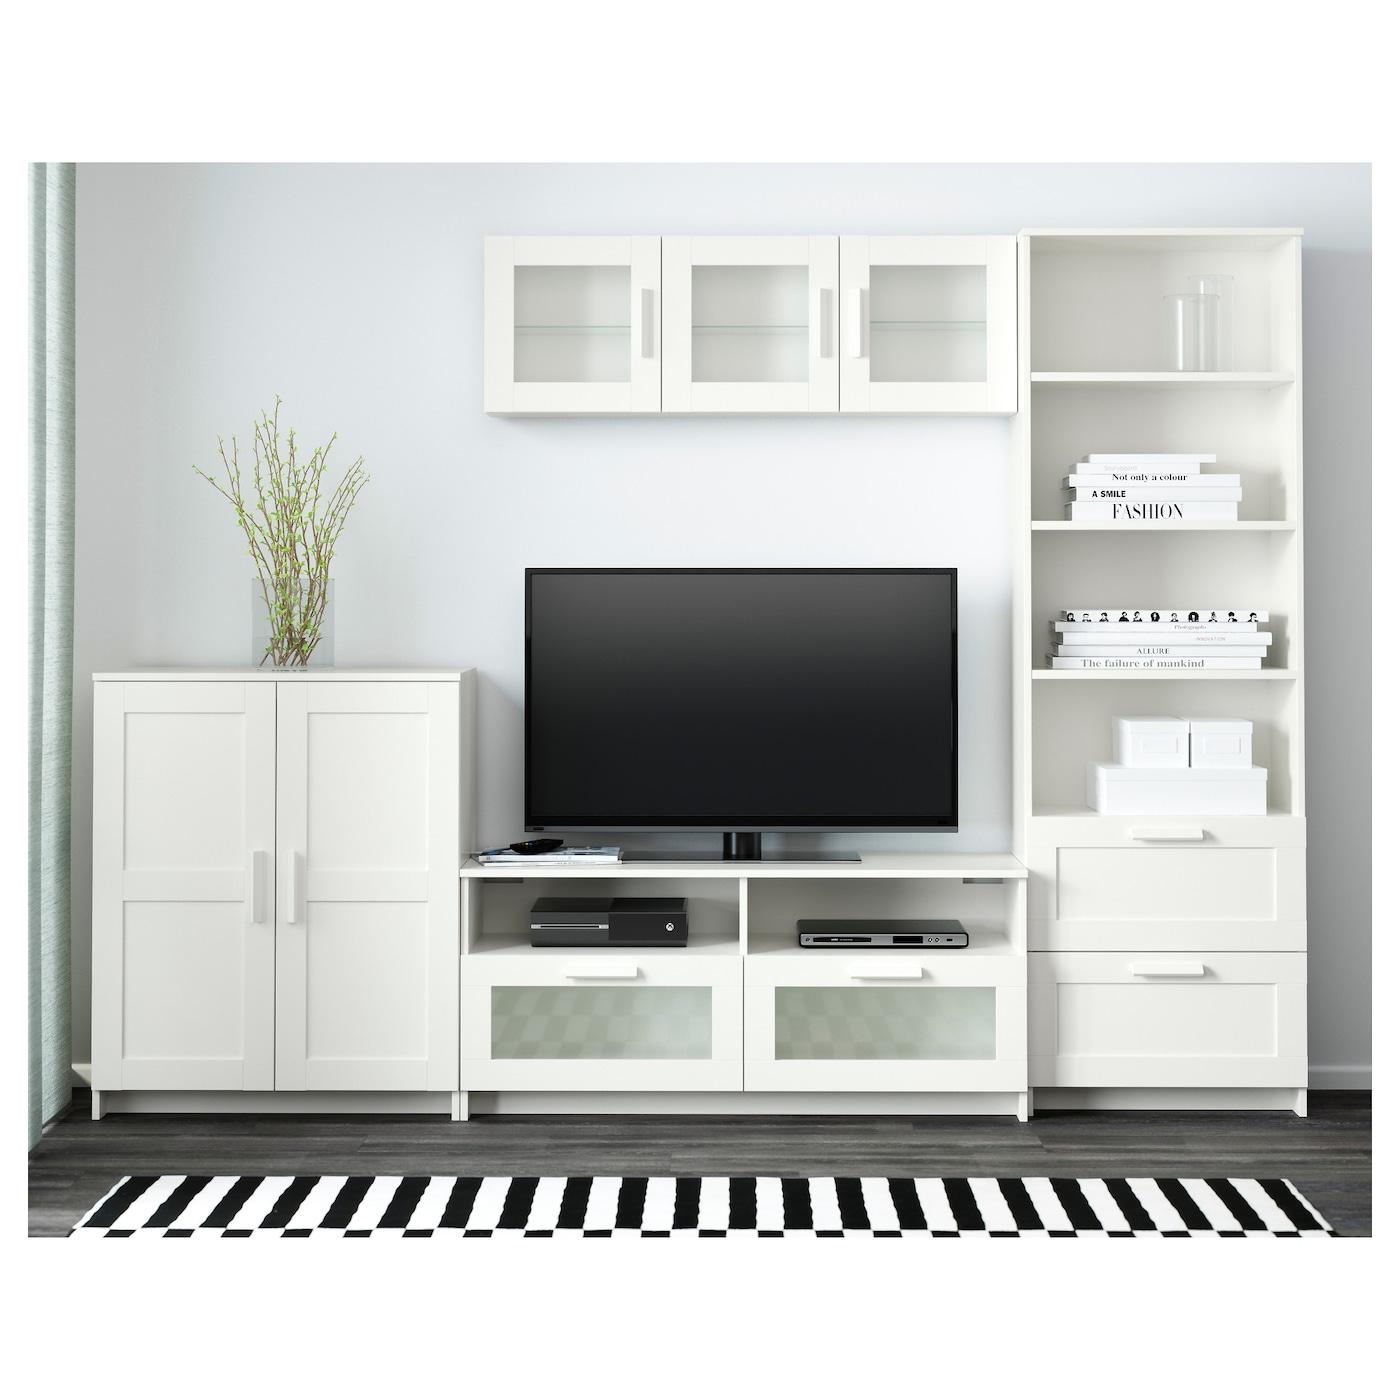 No Furniture Tv Room